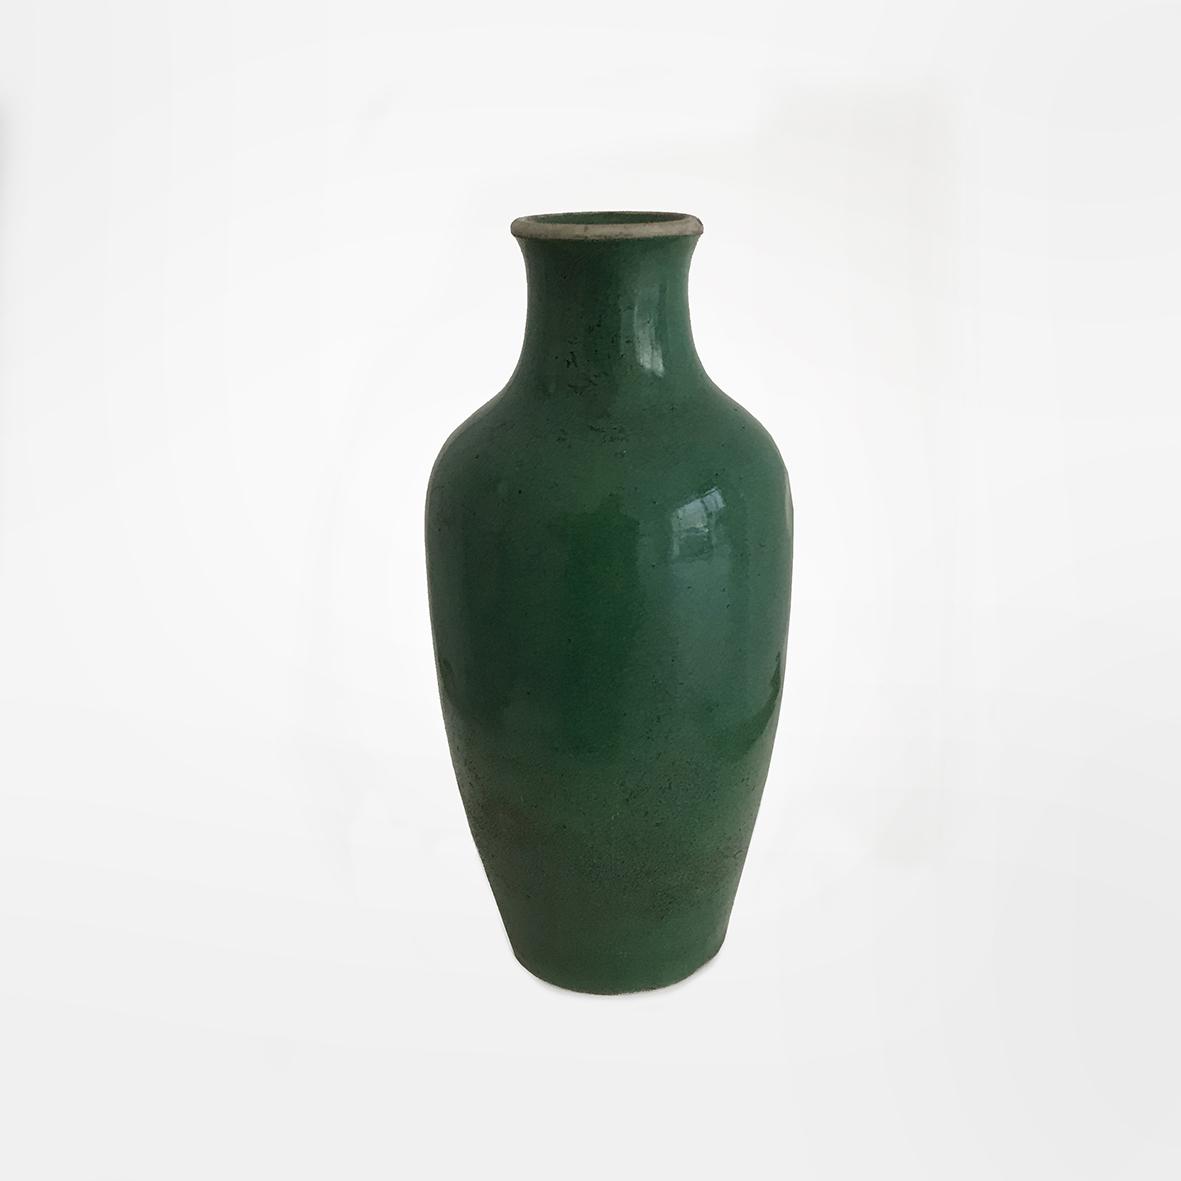 Green bottle vase | Ceramic | China | Kangxi | basedonart gallery